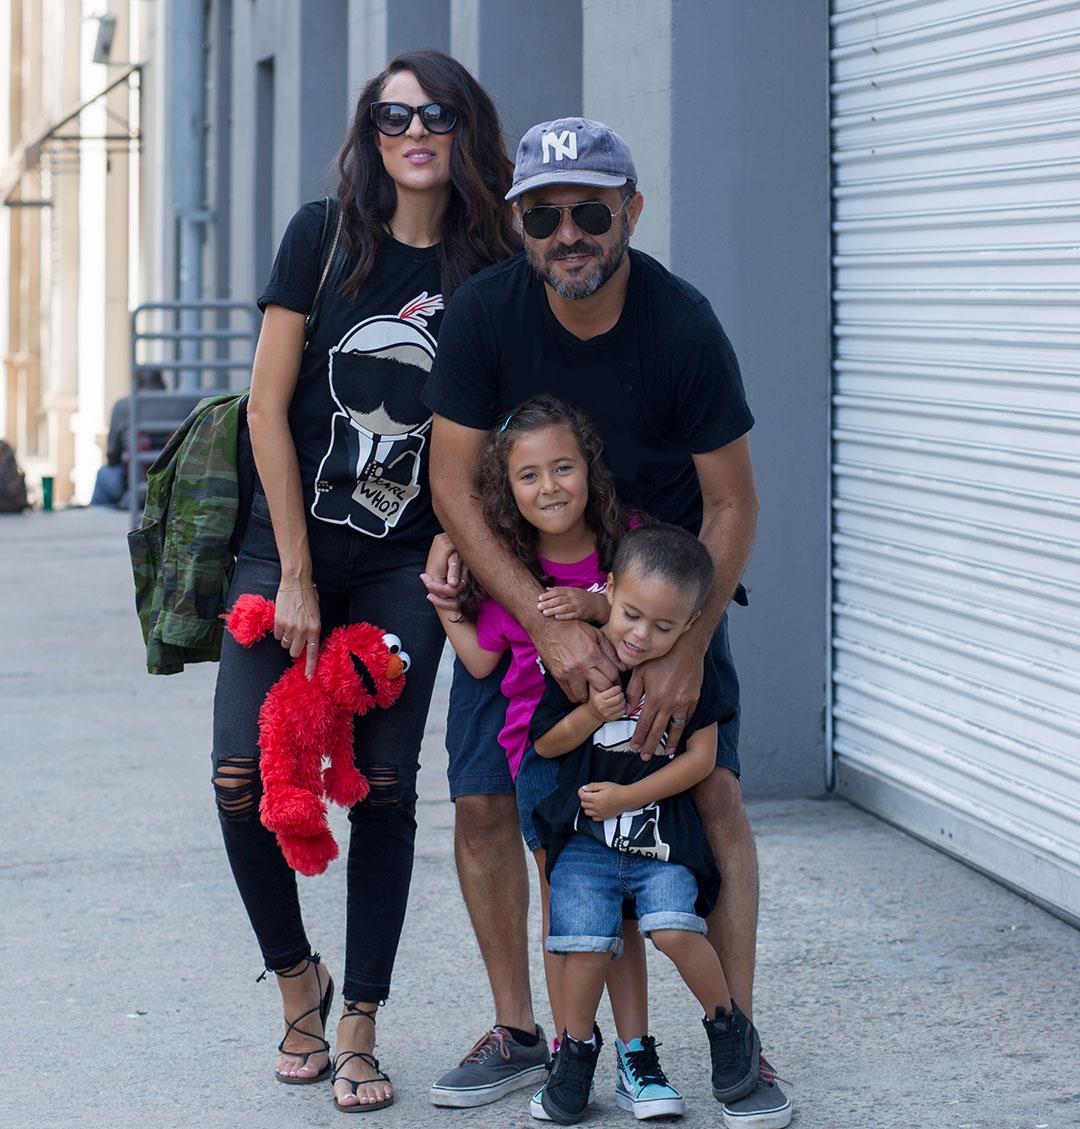 Karl-Who-Shop-Socialitte-Kids-Fashion-Van-Modern-mom-Streetstyle-kids-lucys-whims.jpg